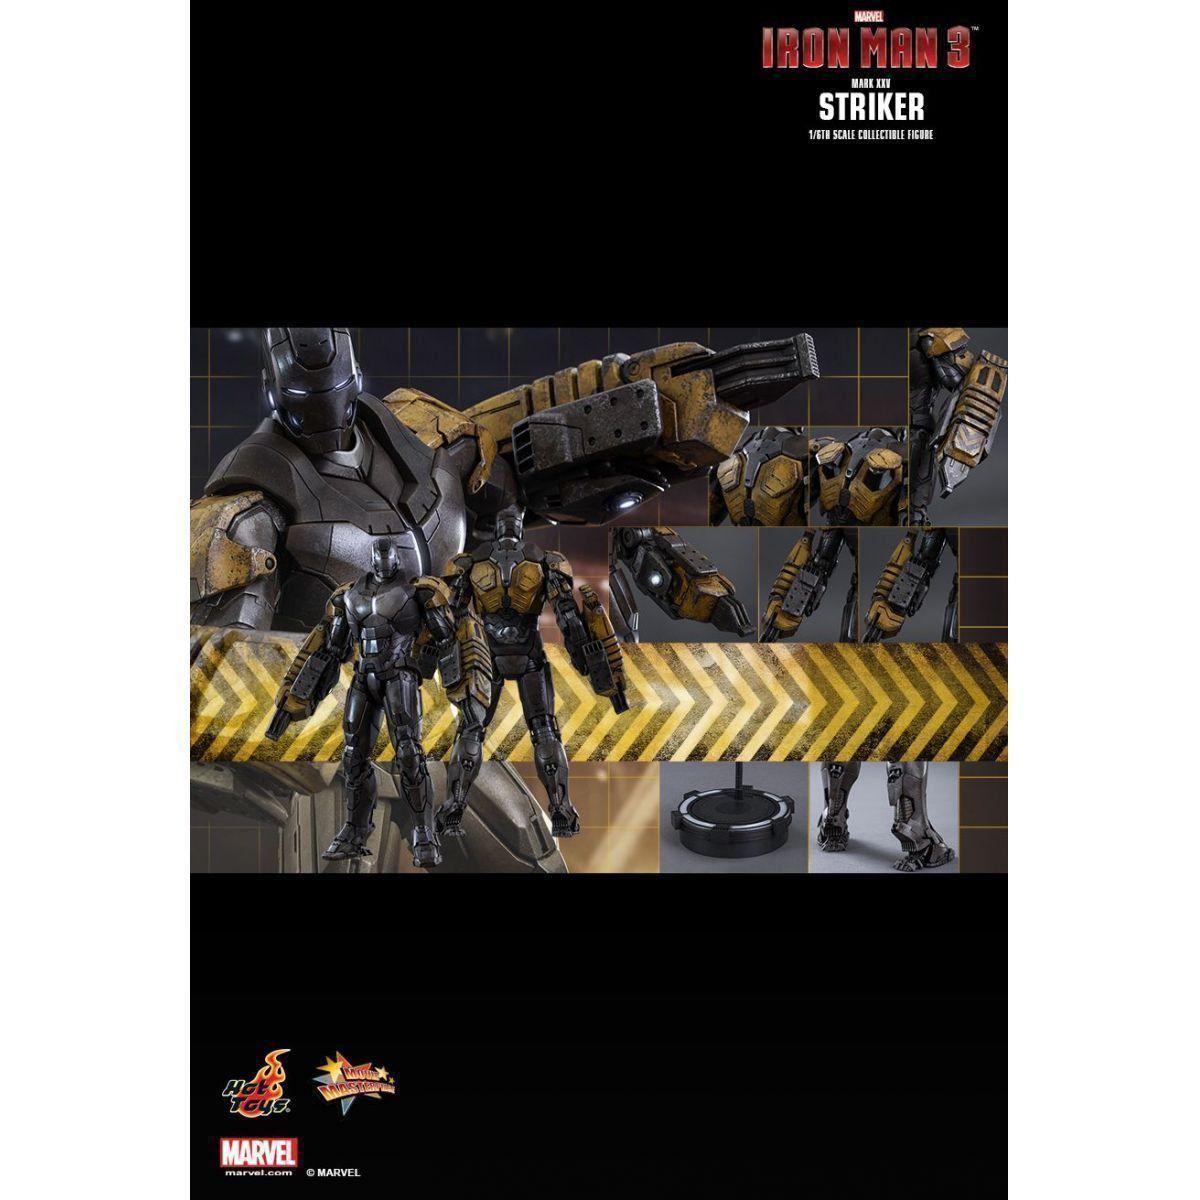 Boneco Iron Man Mark XXV Striker: Homem de Ferro 3 (Iron Man 3) Escala 1/6 (MMS332) - Hot Toys - CD